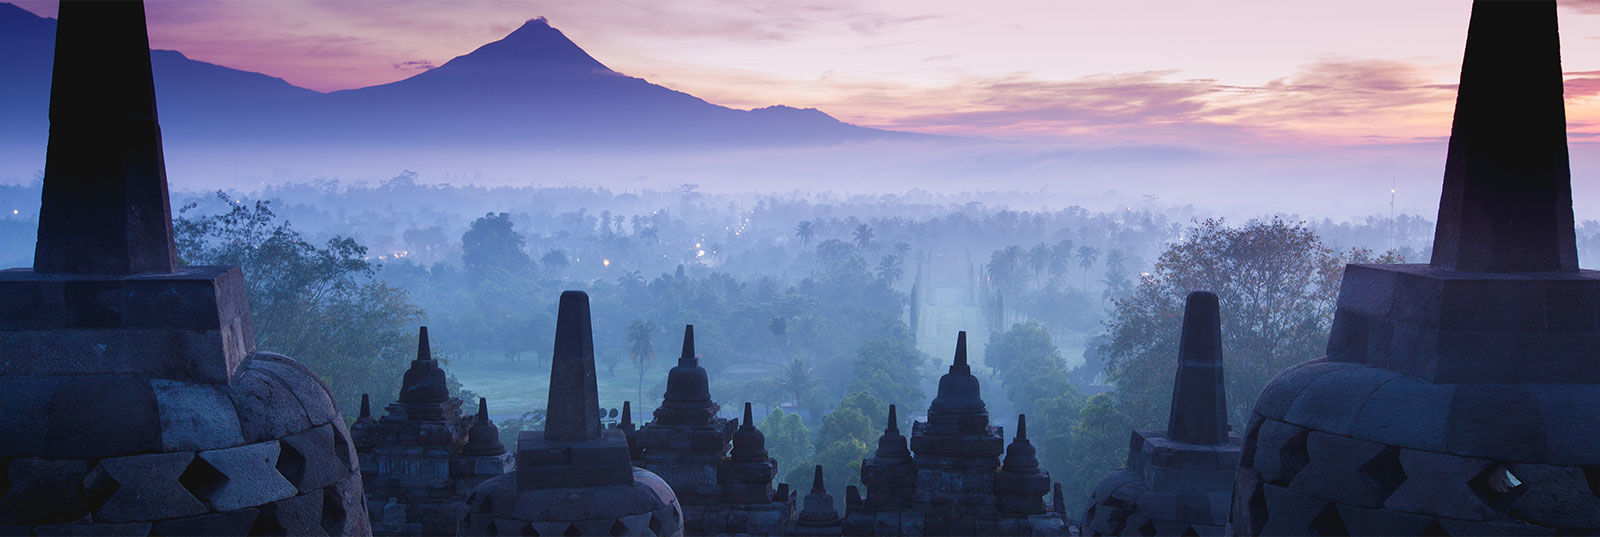 Guía turística de Bali